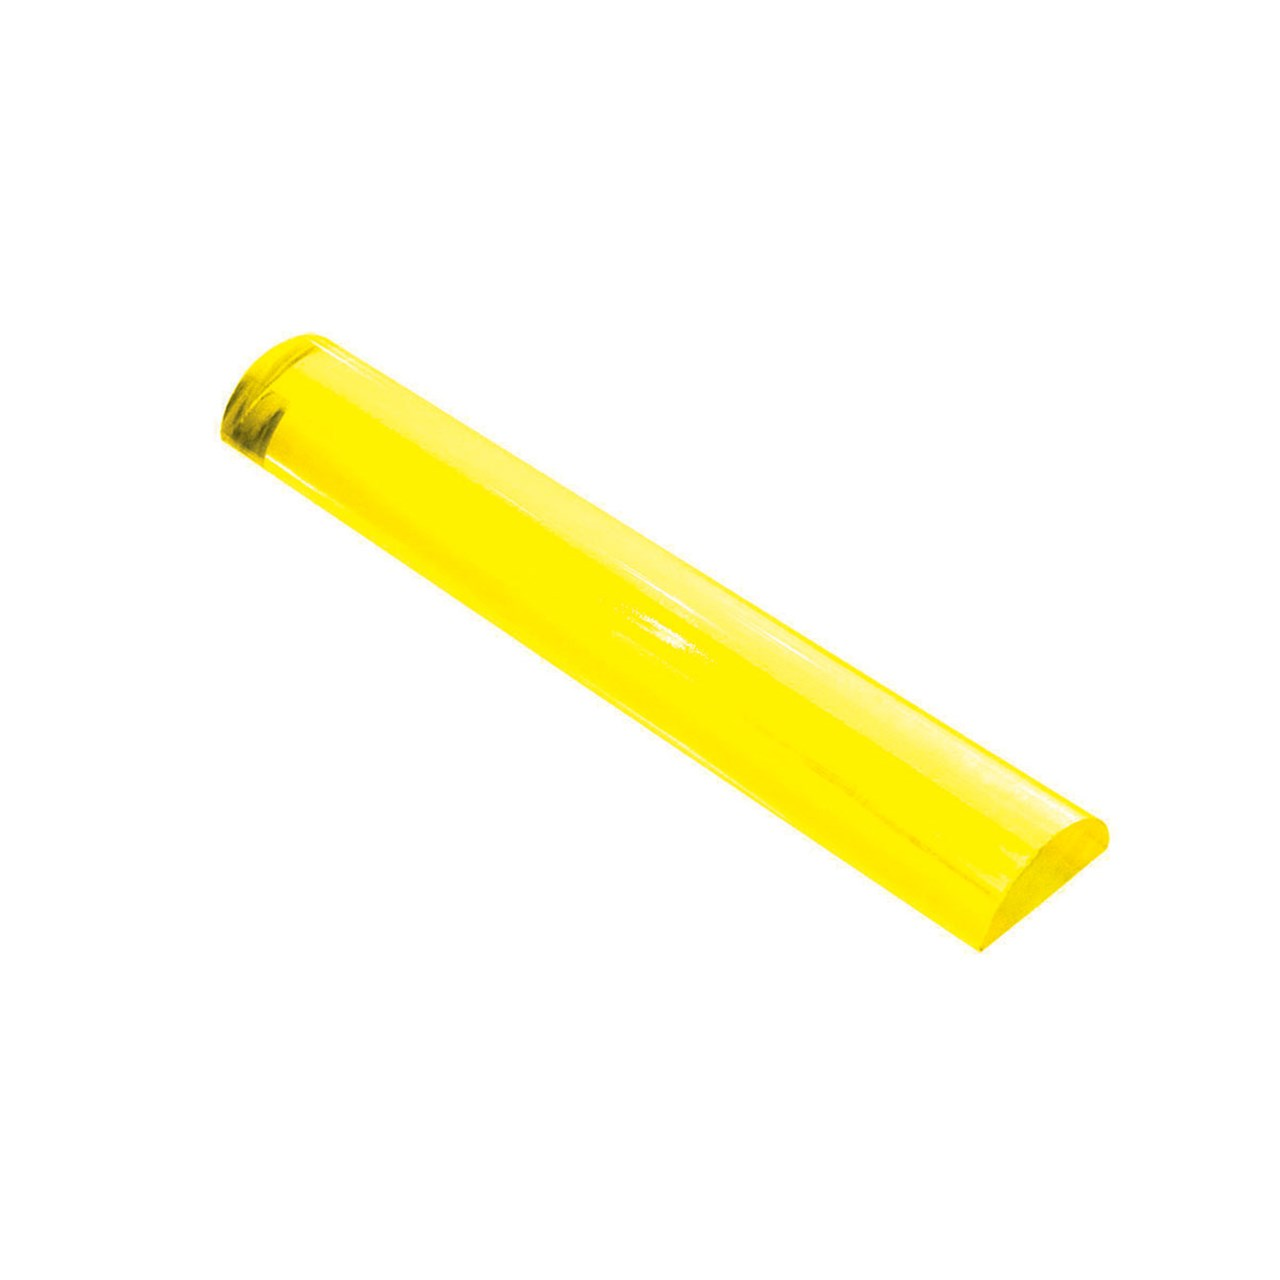 EZ Magnibar - All Yellow - 9 inches